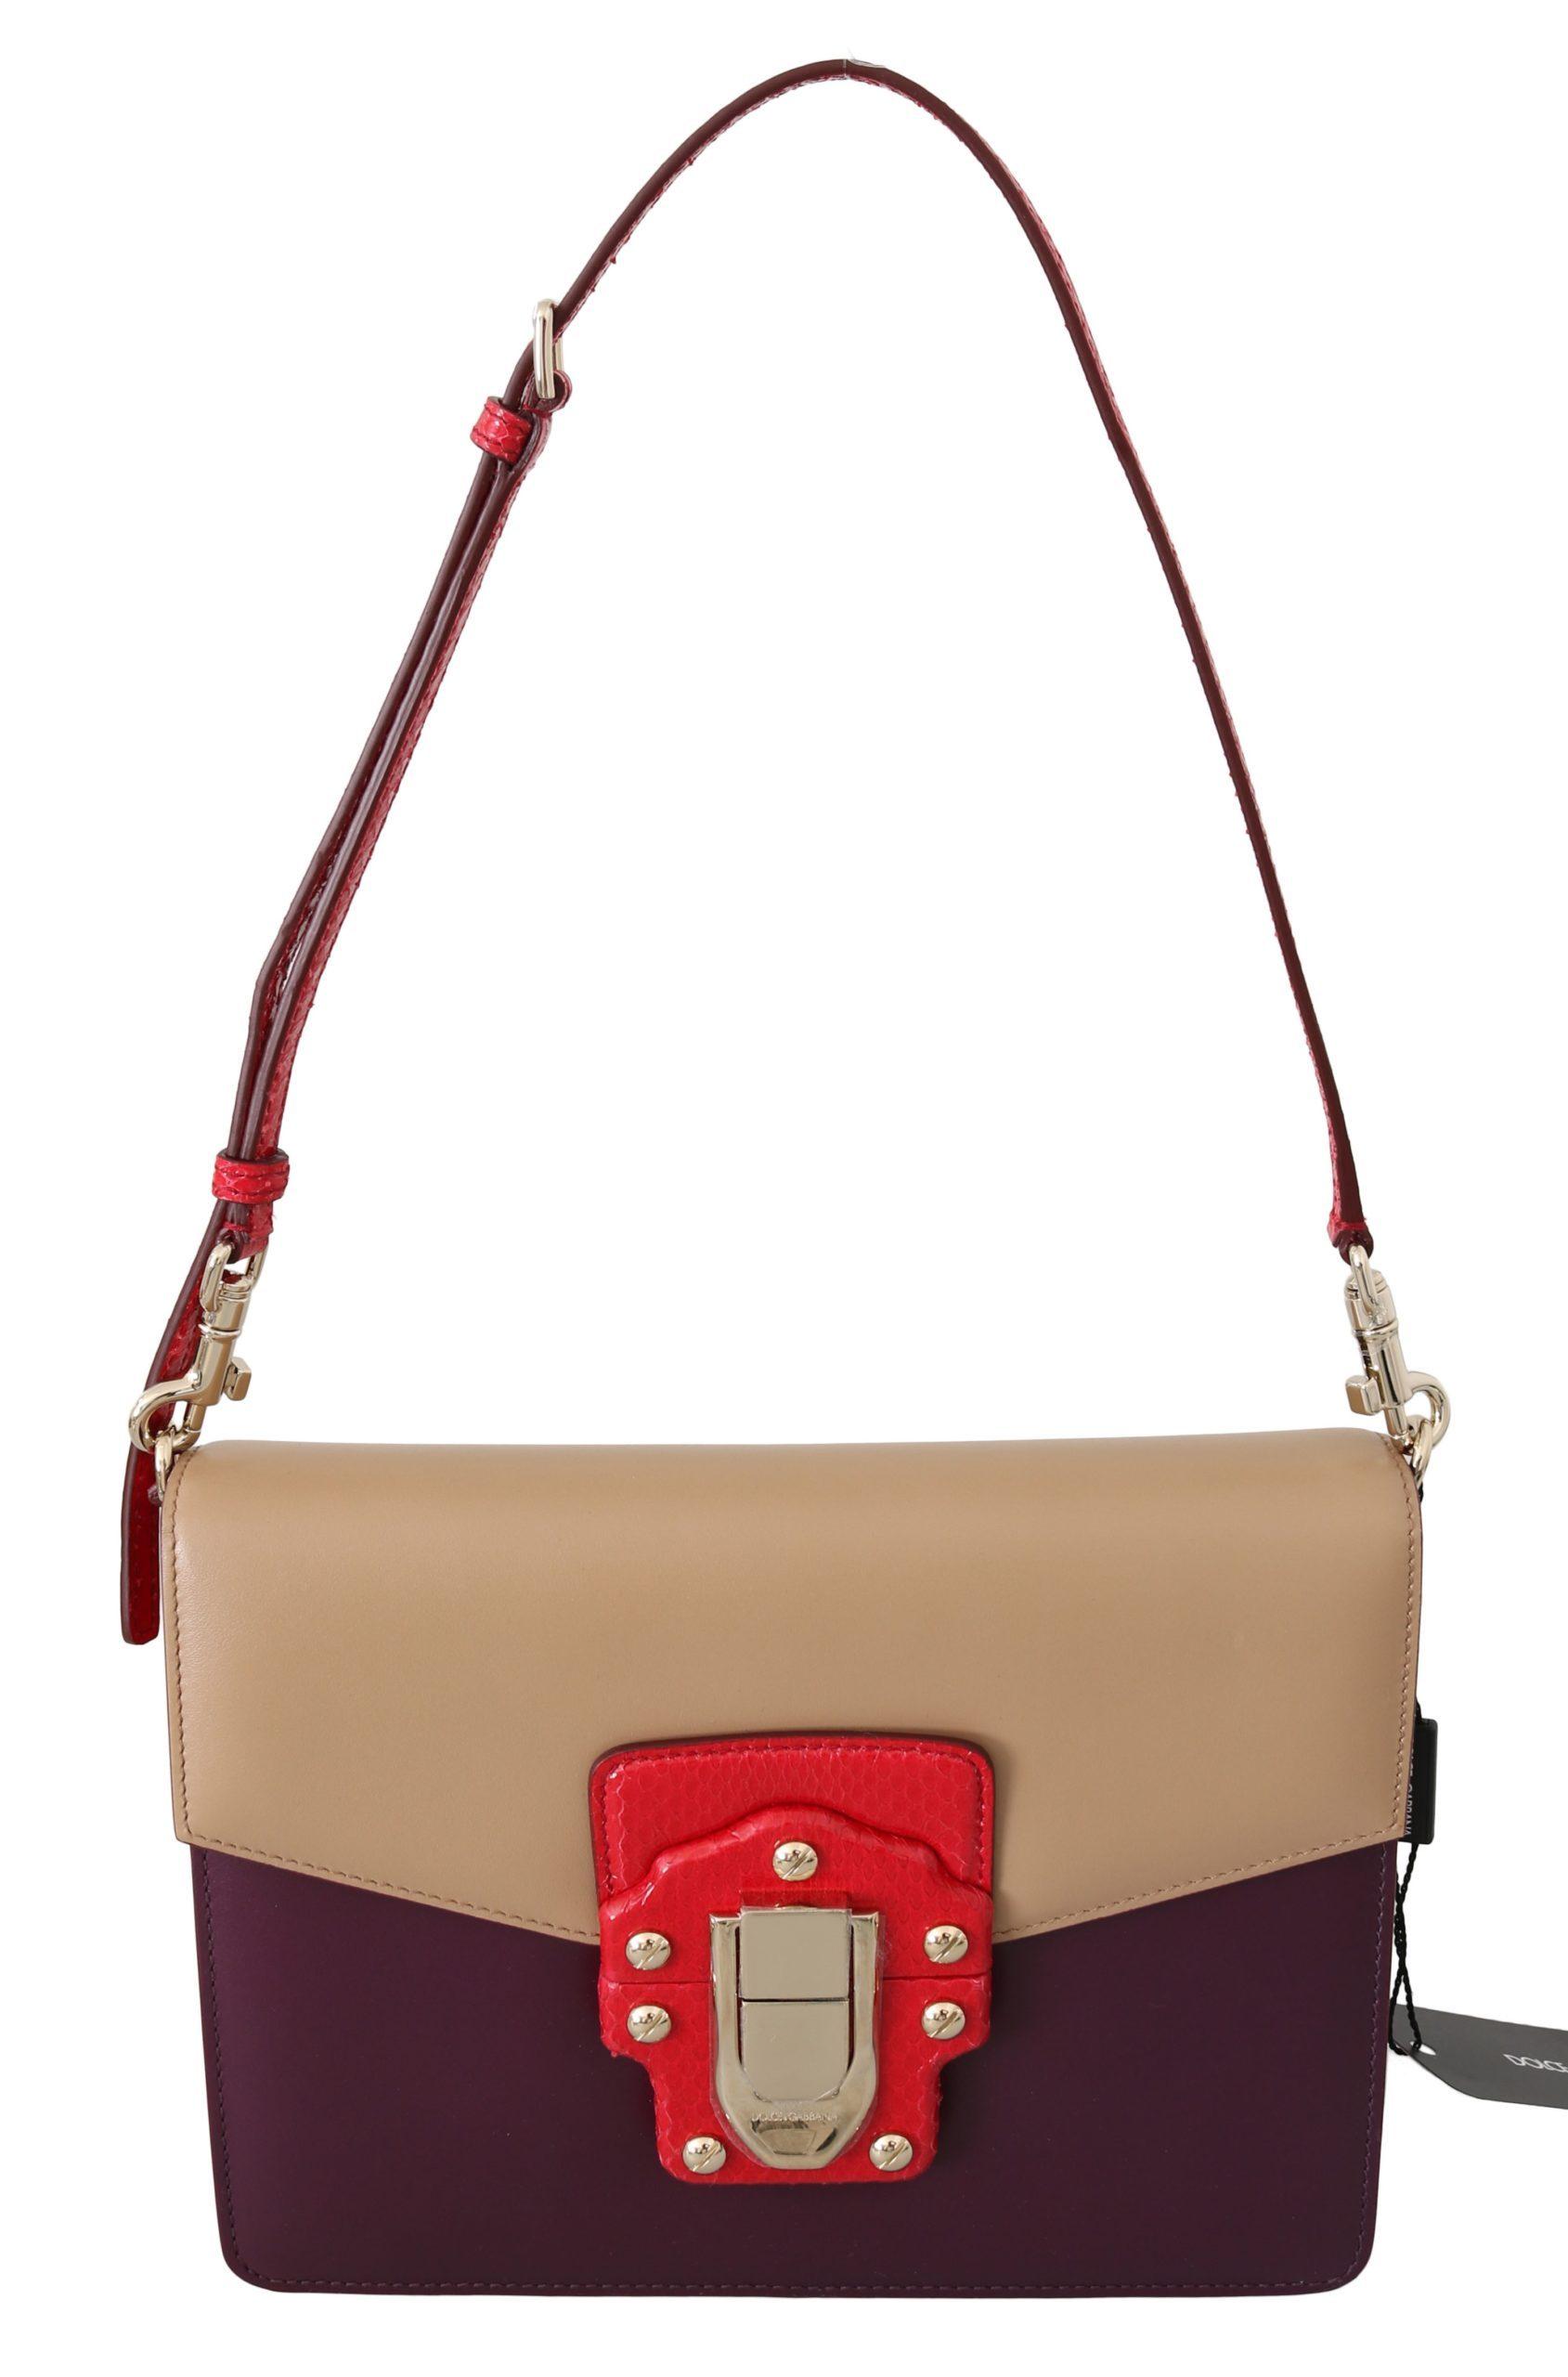 Dolce & Gabbana Women's Leather Shoulder Bag Purple VAS8681